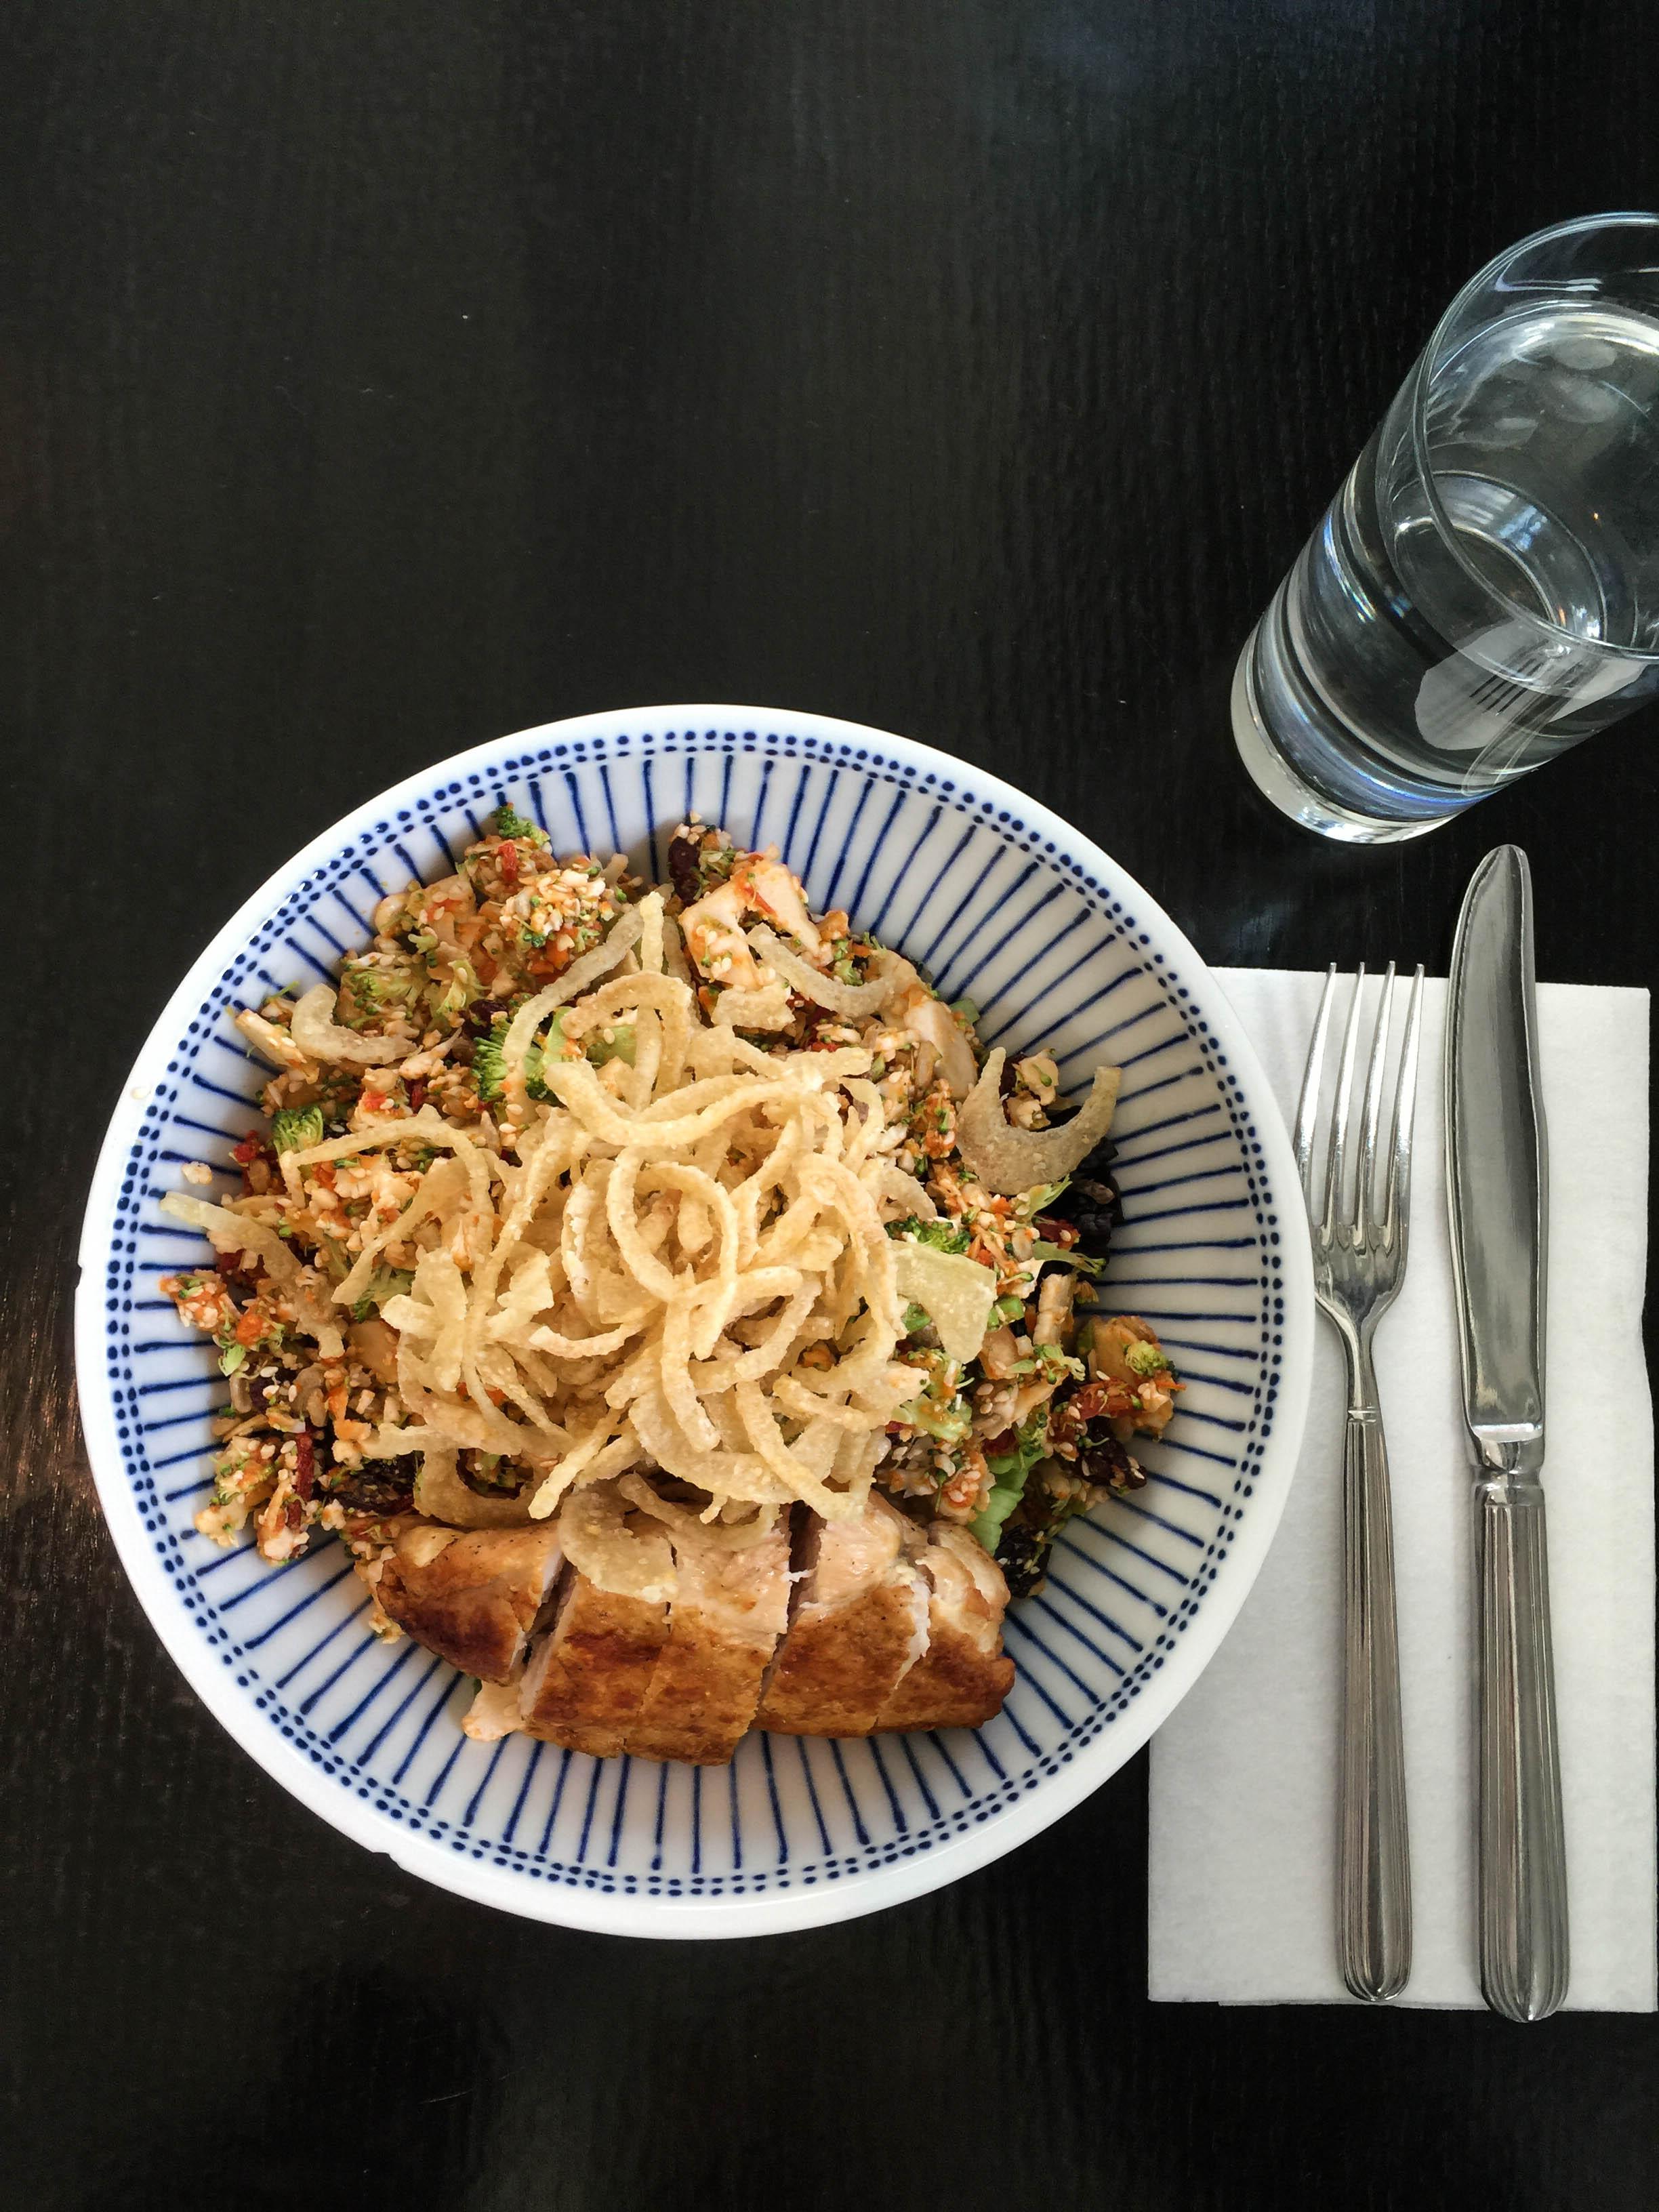 Nickel & Diner - A Taste of New York